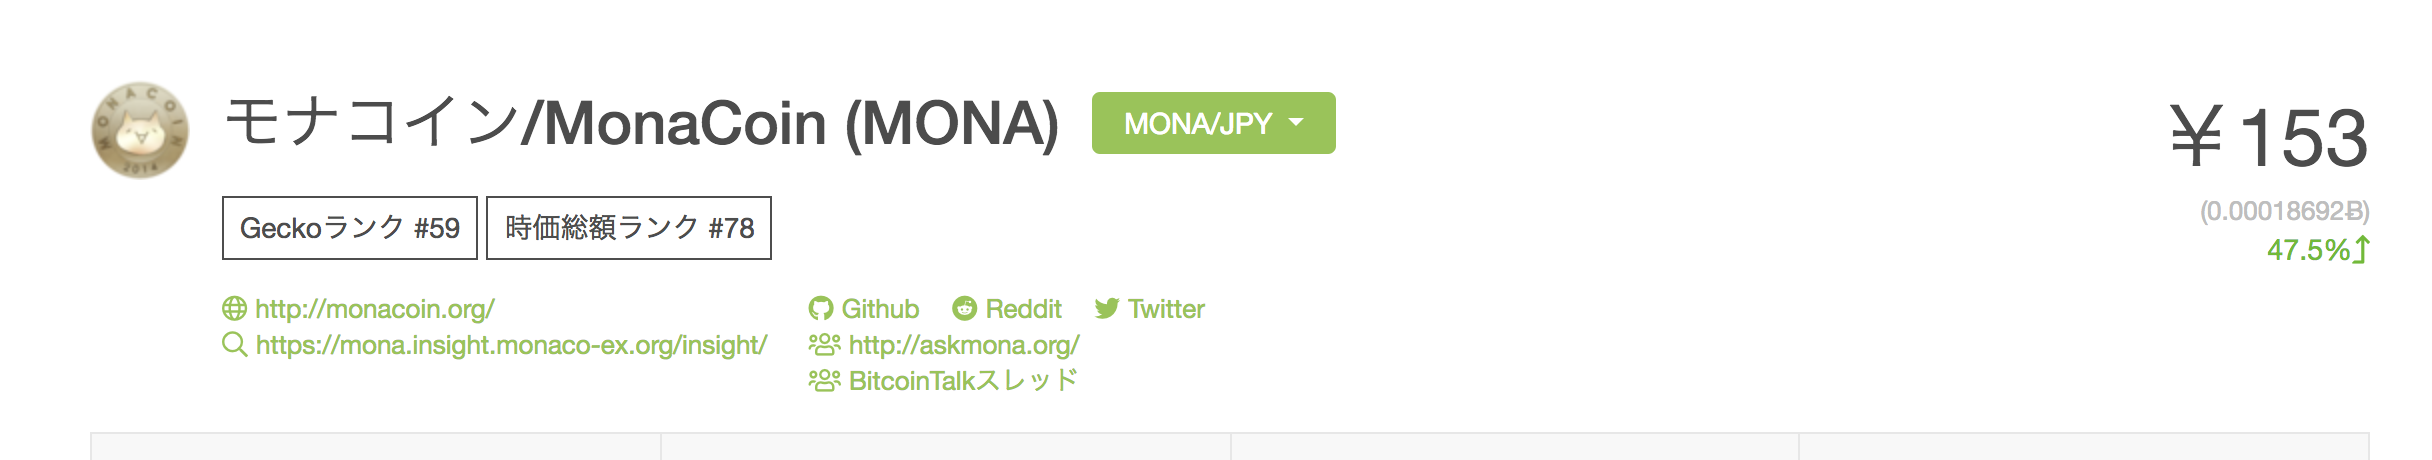 MonaCoin(モナコイン) 9月21日 高騰